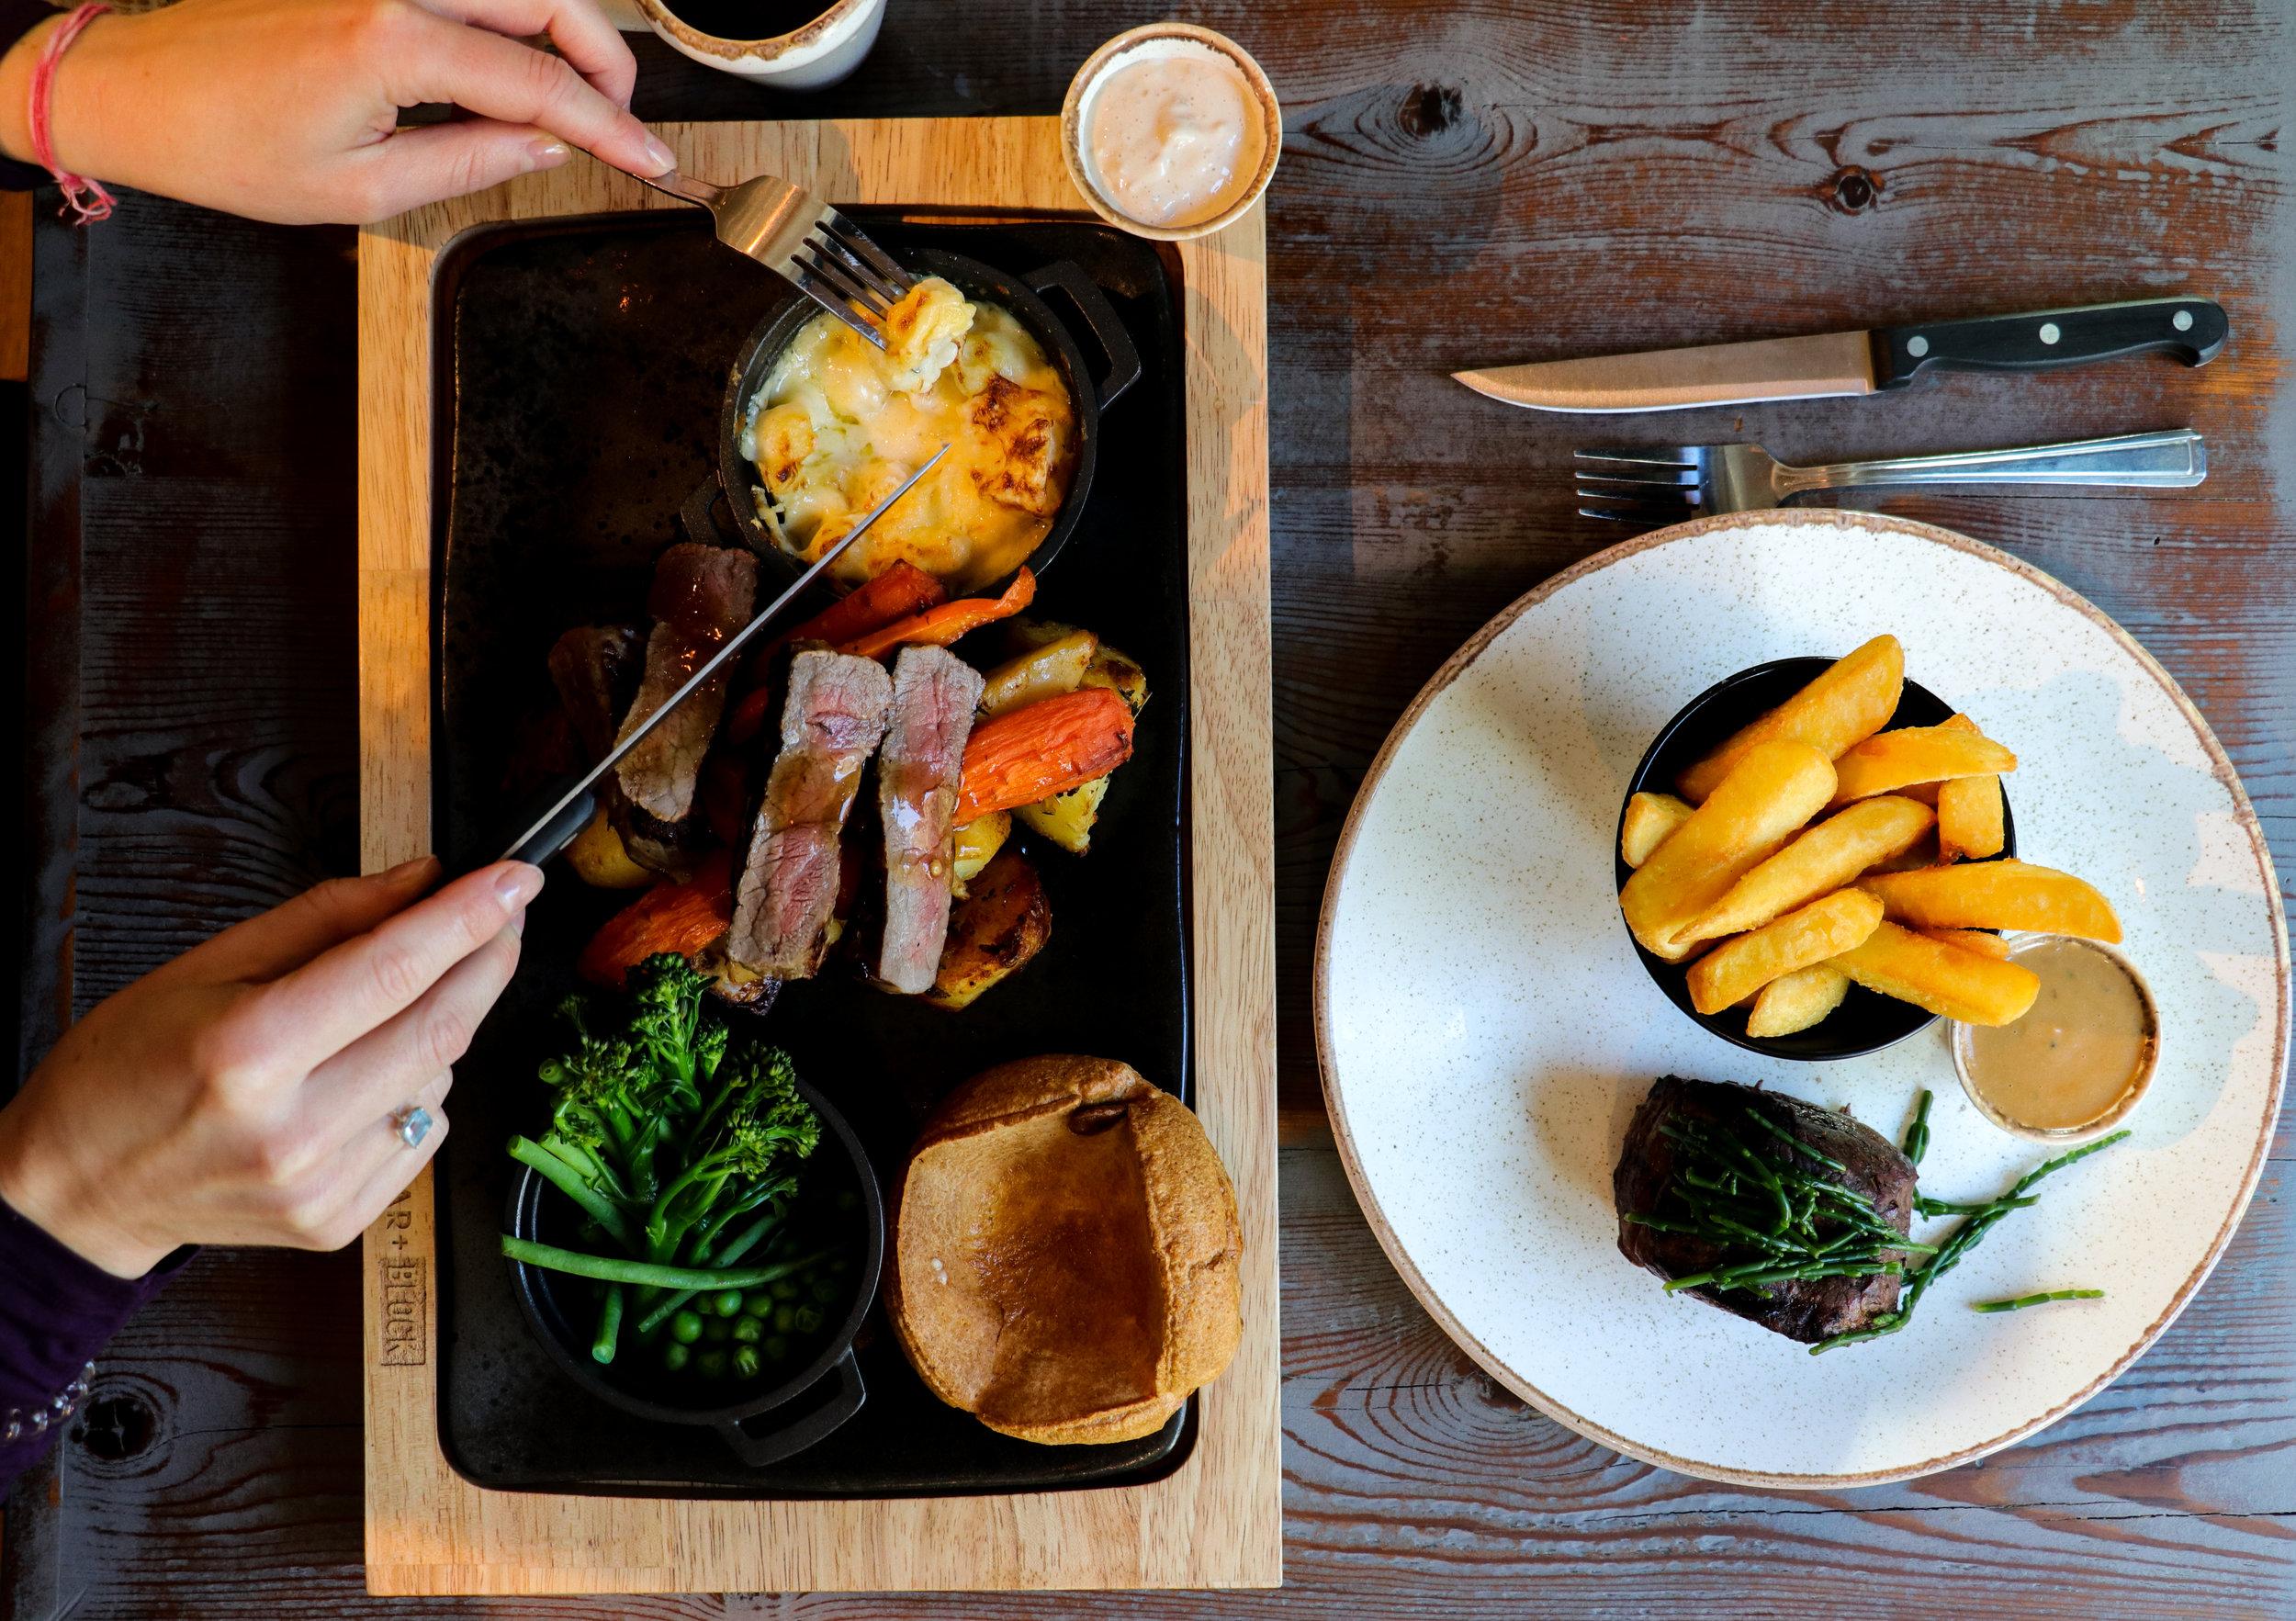 Bar + Block Steakhouse - Bath - 14th November 2017